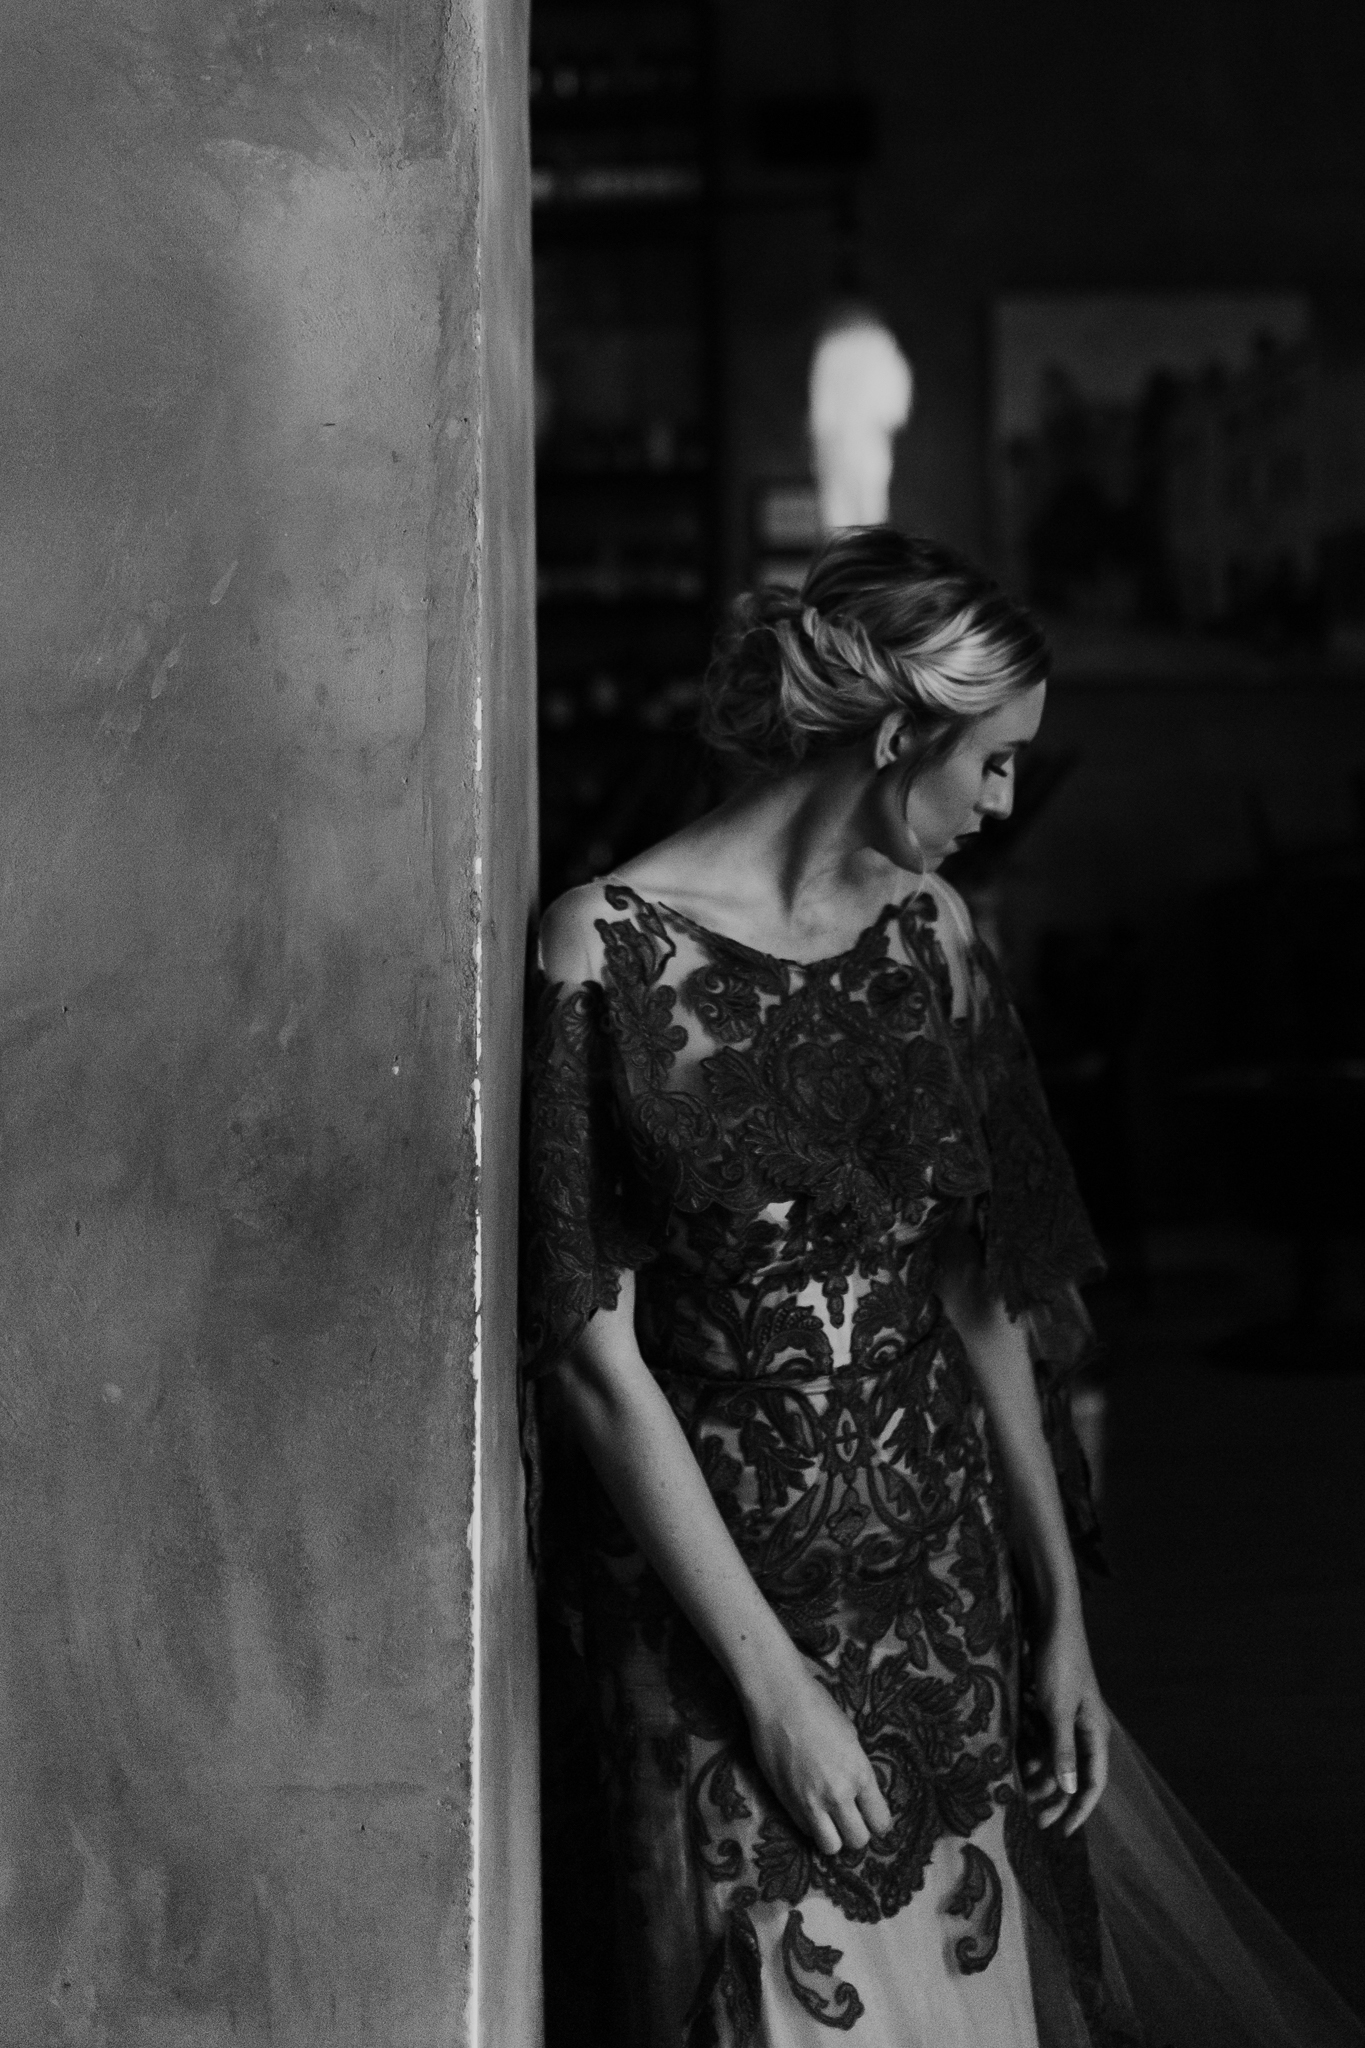 charleston-styled-shoot-wedding-photographer-moody-inspired-south-carolina-columbia-5-34.jpg